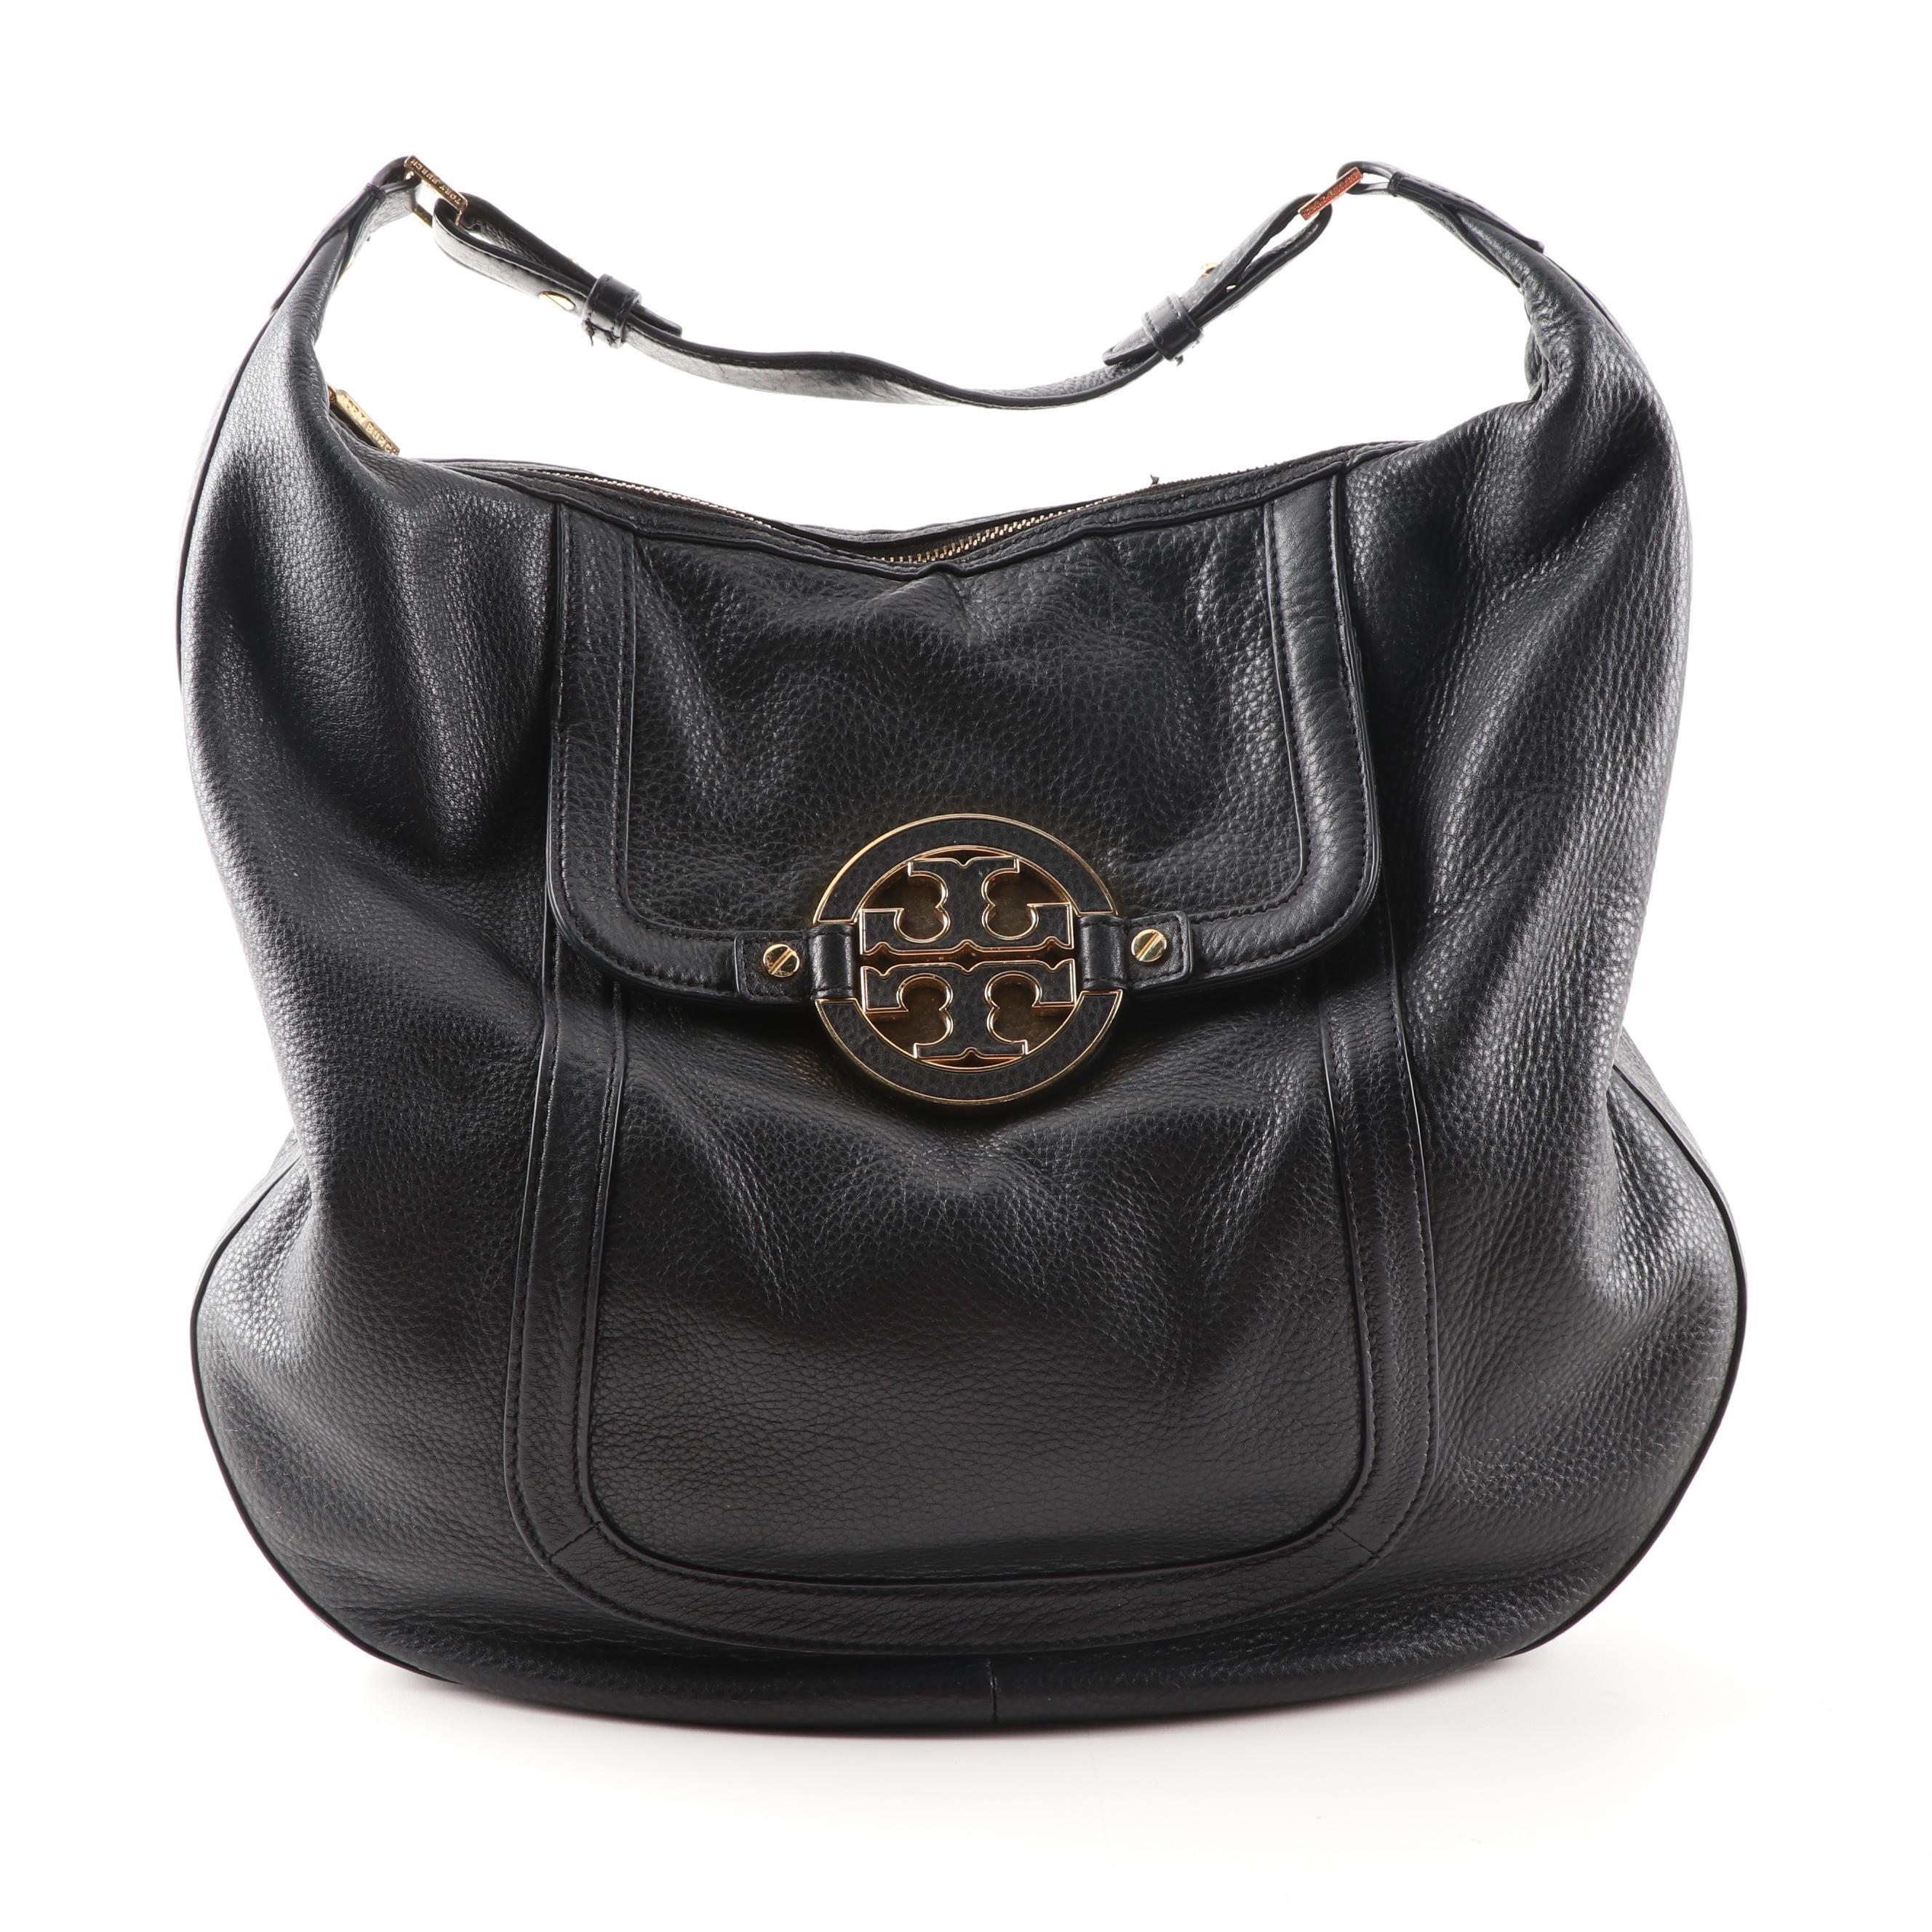 Tory Burch Amanda Black Pebble Leather Hobo Bag